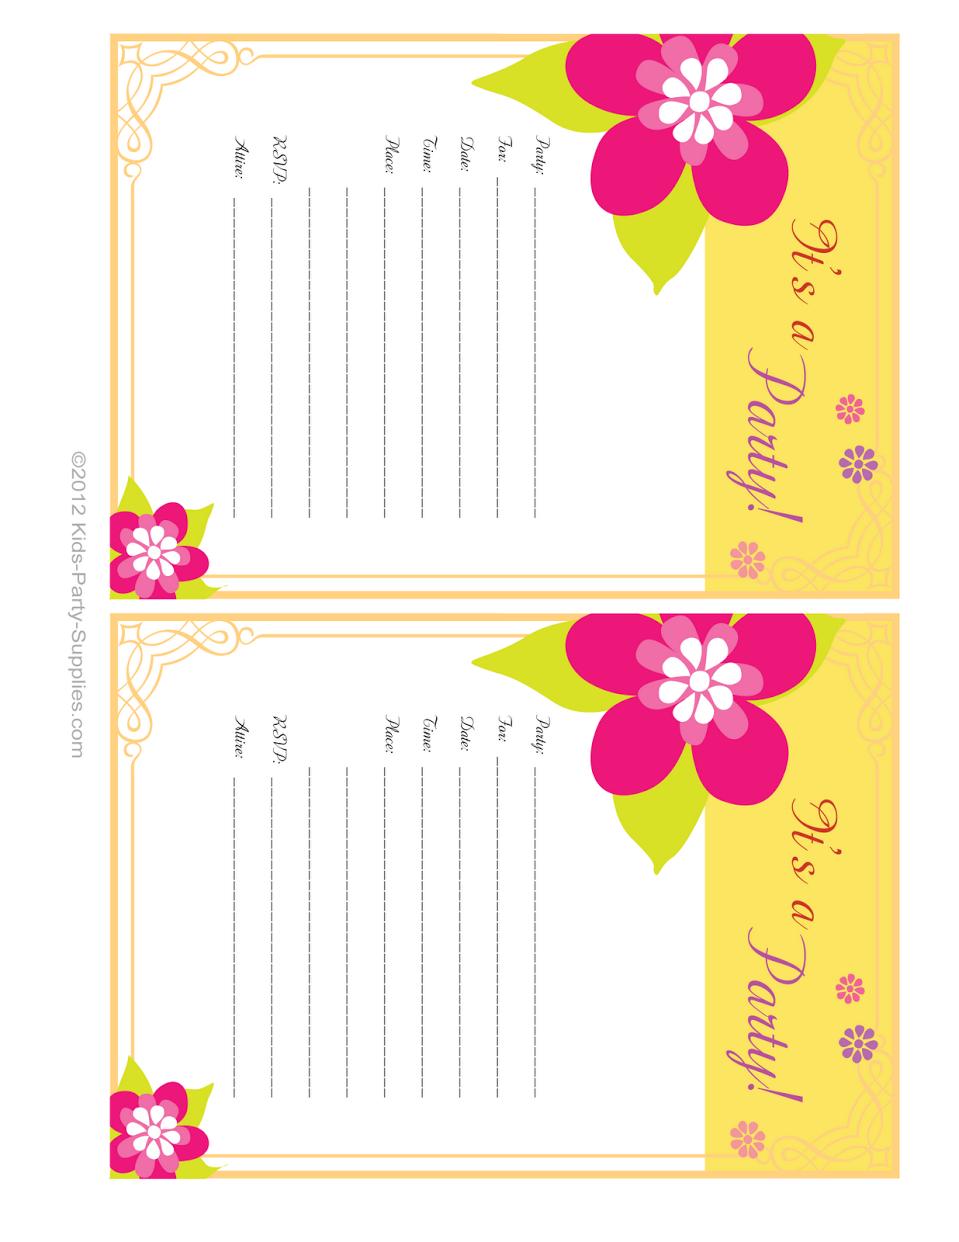 Hawaiian Party Invitations Free Printable | Party Invitations | Free - Hawaiian Party Invitations Free Printable